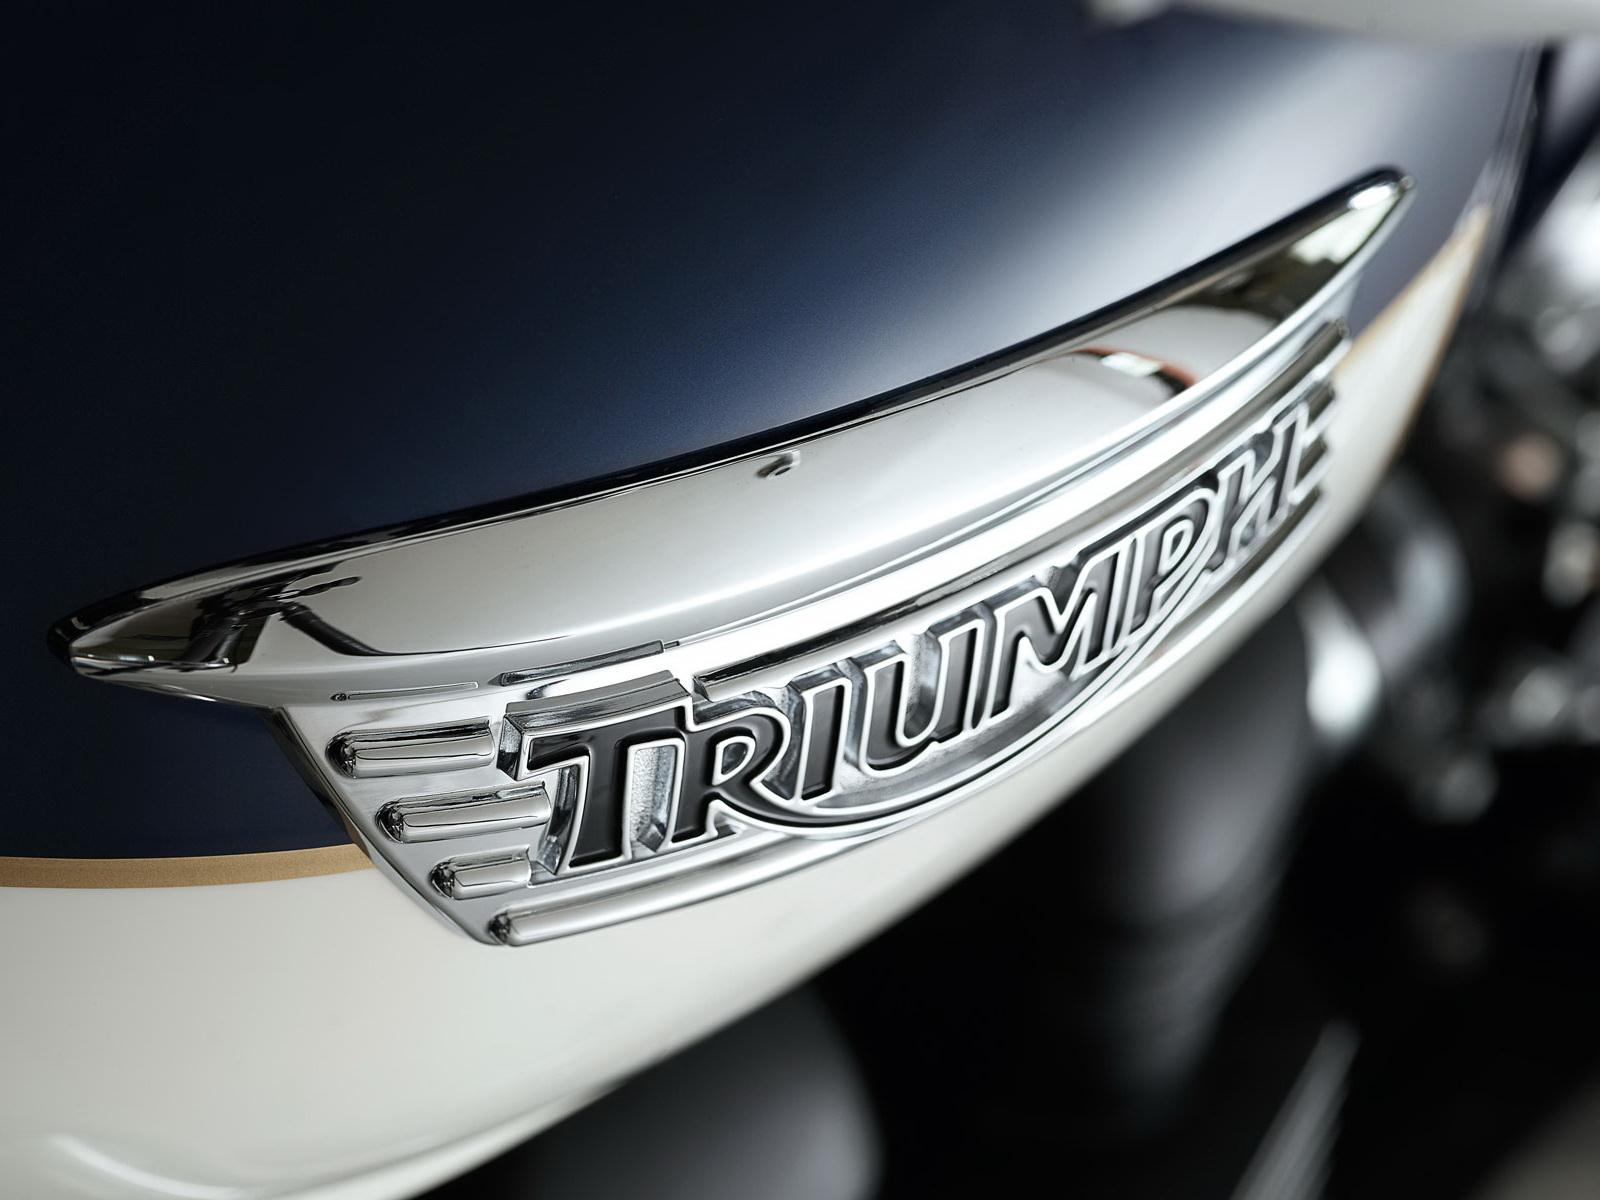 Triumph Logo Wallpaper 43826 1600x1200 px ~ HDWallSource.com